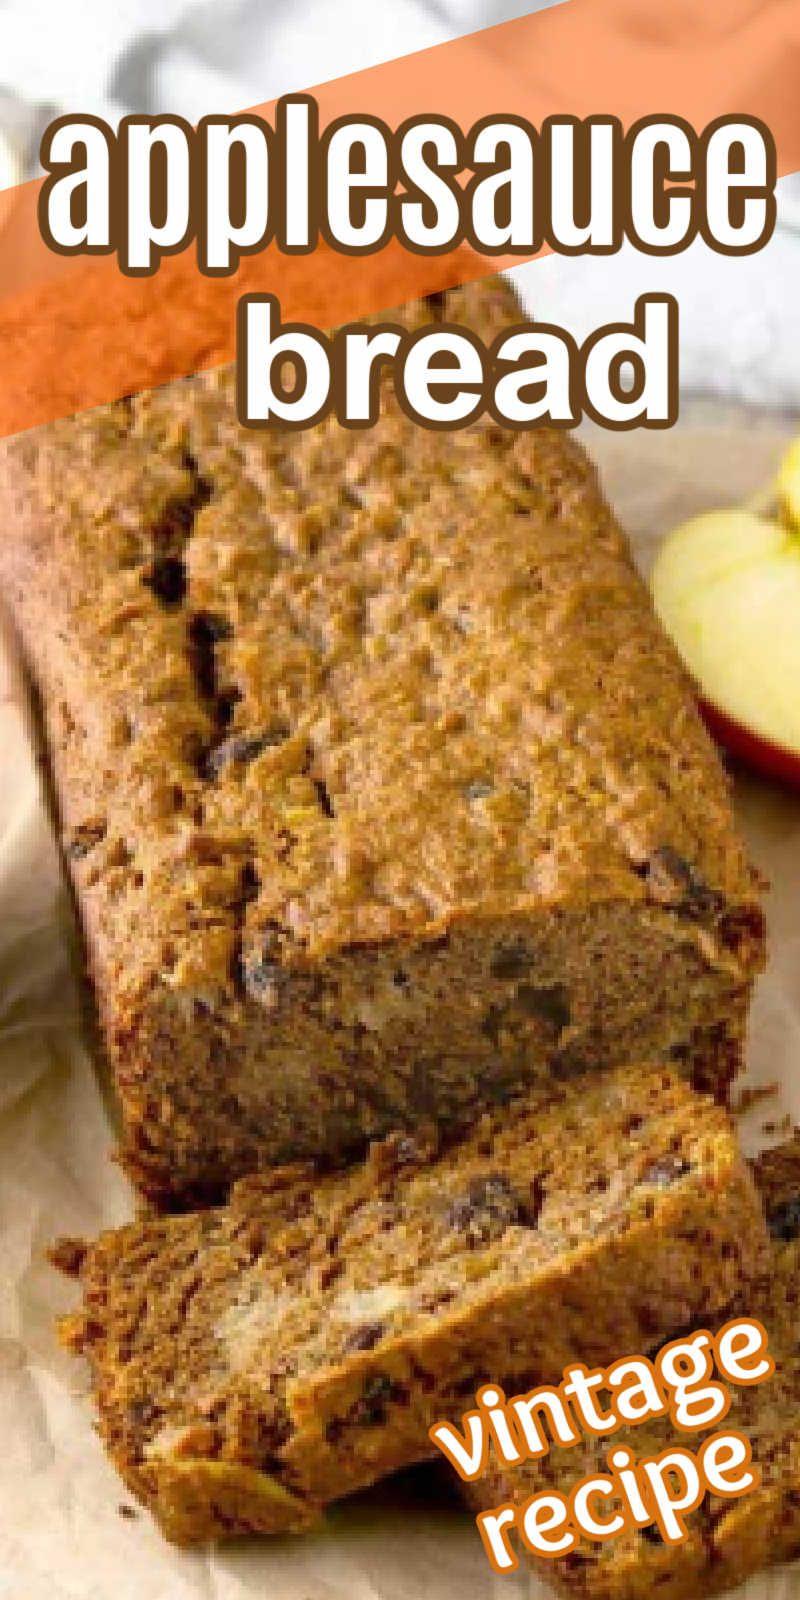 Easy Applesauce Bread In 2020 Interesting Food Recipes Best Bread Recipe Applesauce Bread